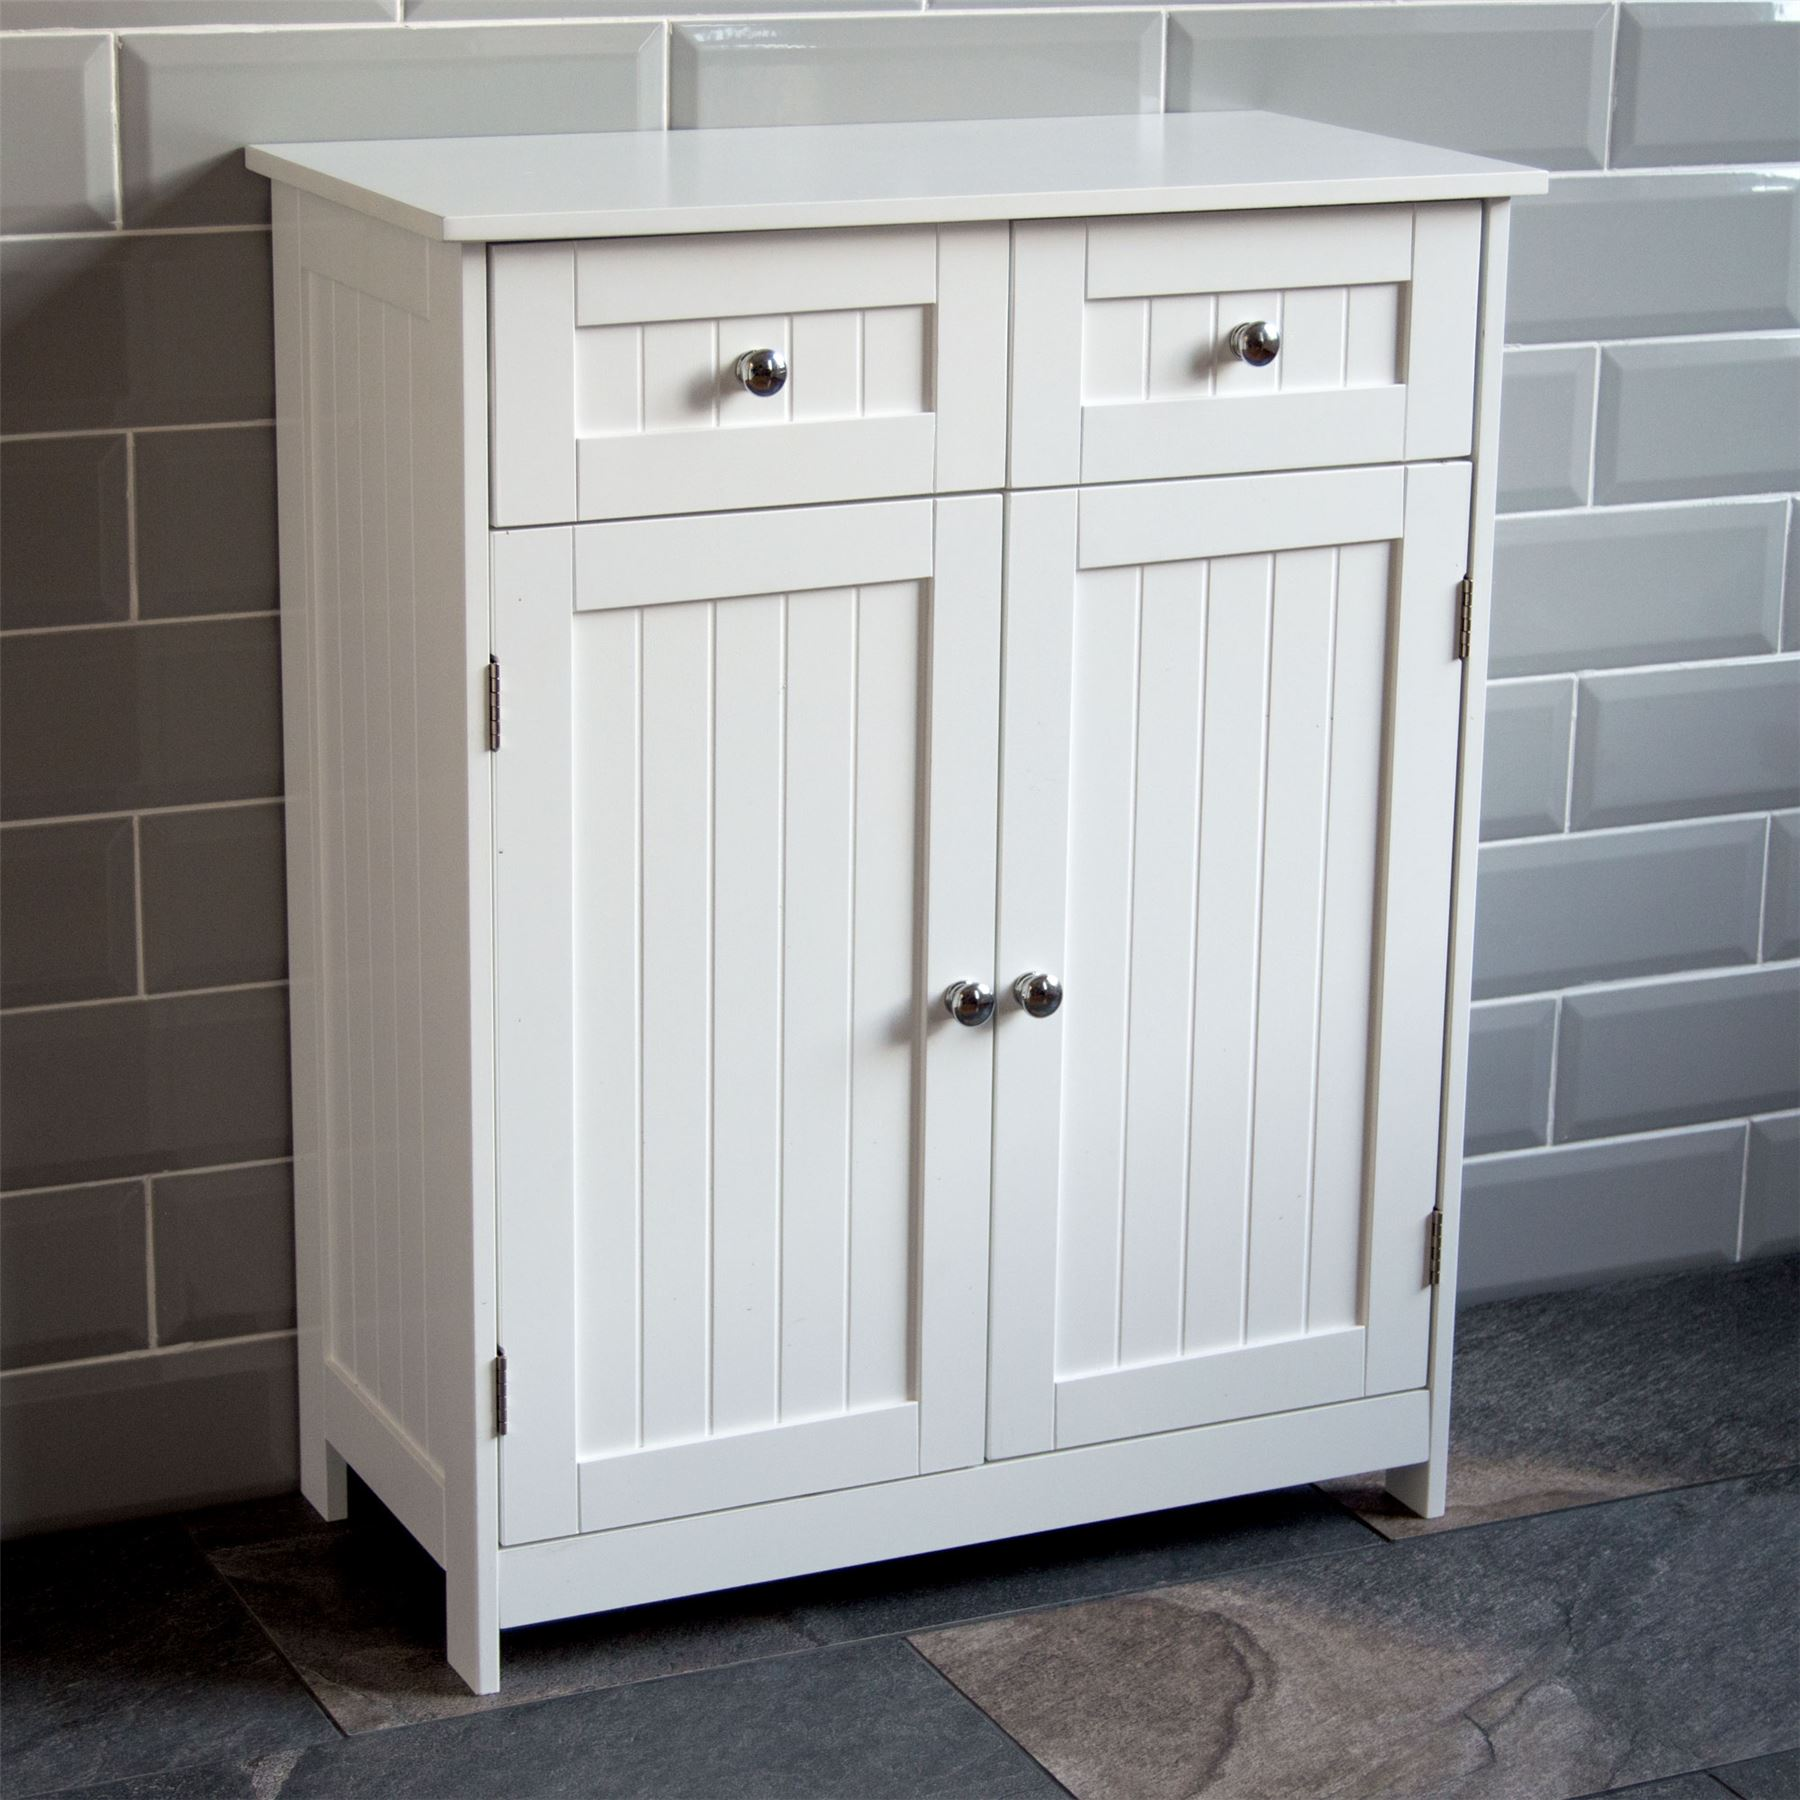 Priano Bathroom Cabinet 2 Drawer 2 Door Storage Cupboard